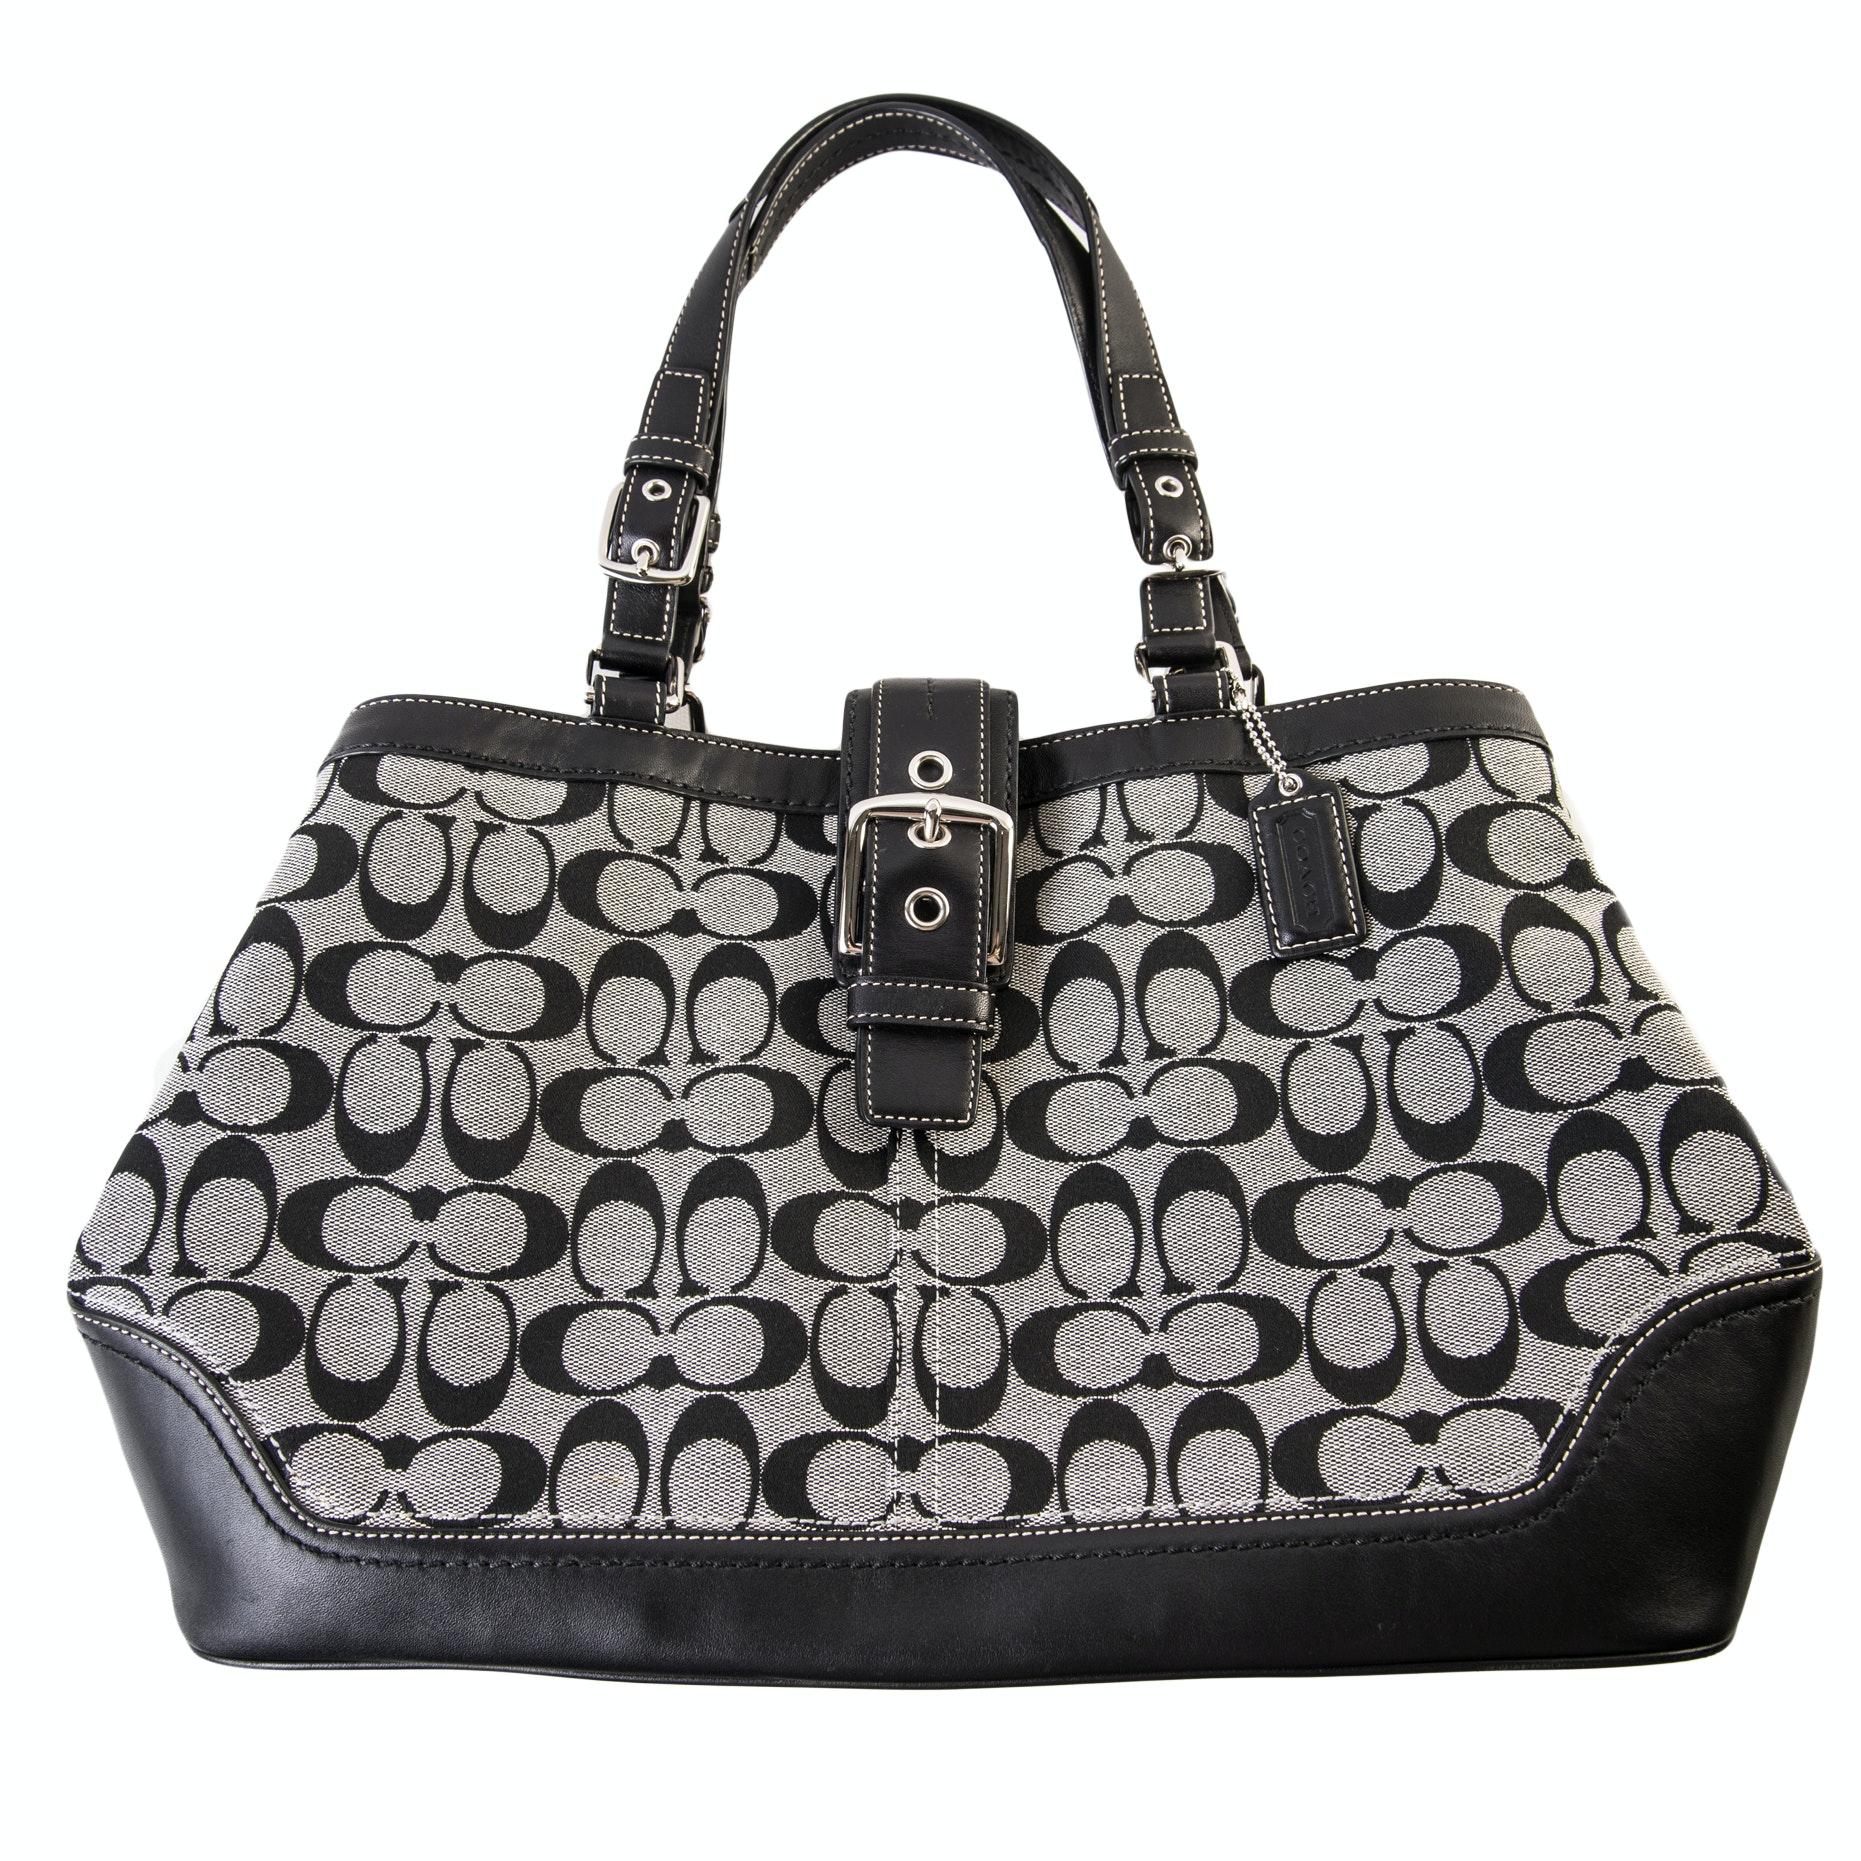 Coach Signature Hampton Carryall Handbag